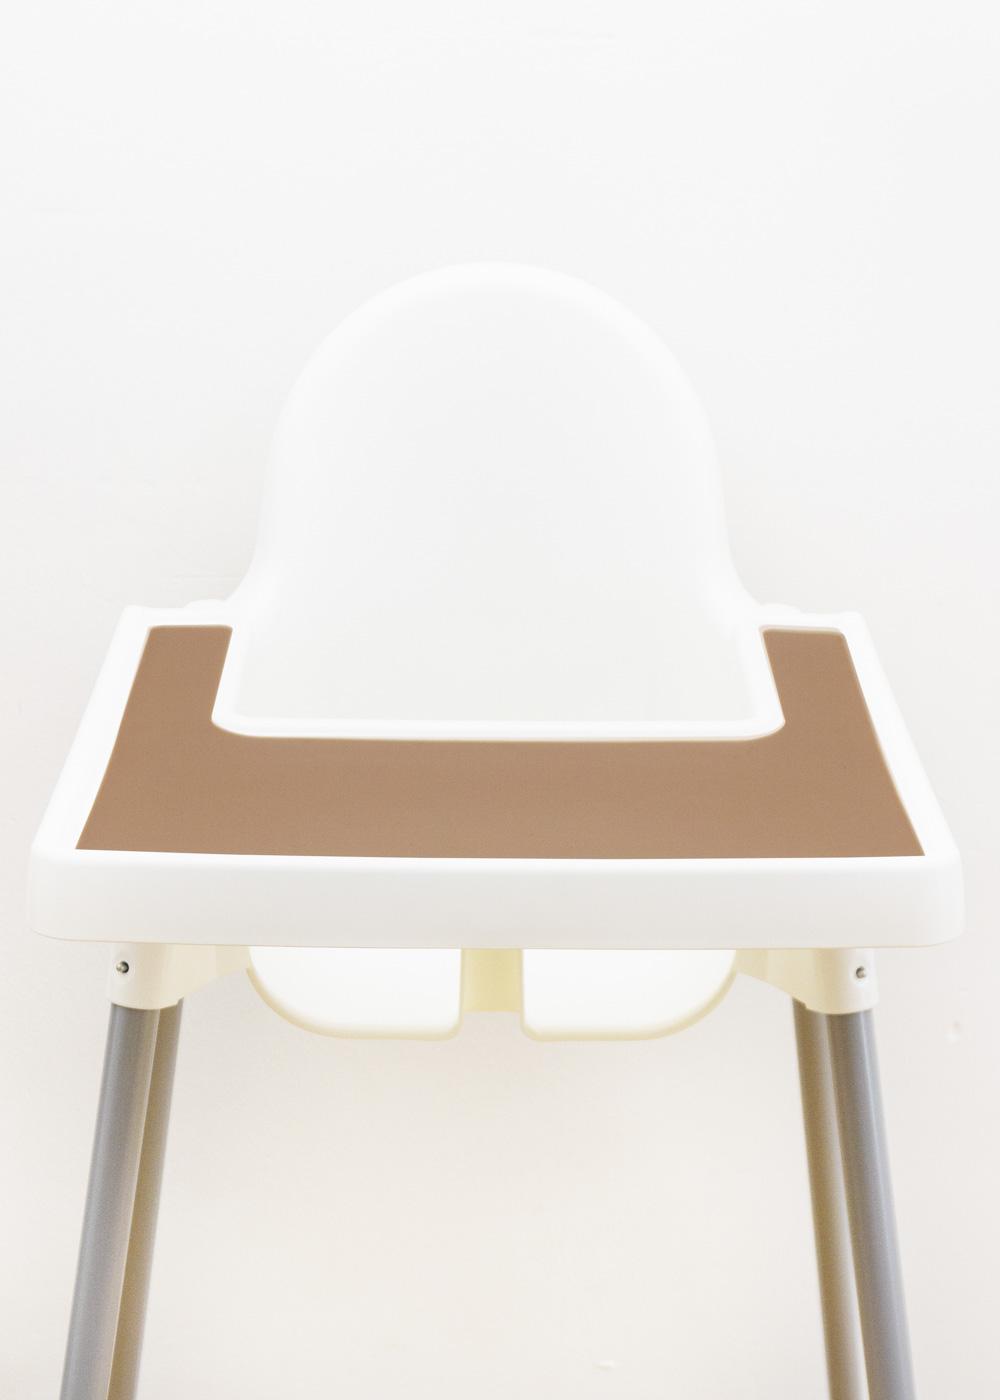 Silikonmatte Ikea Antilop Hochstuhl Klecka Mat terrakotta